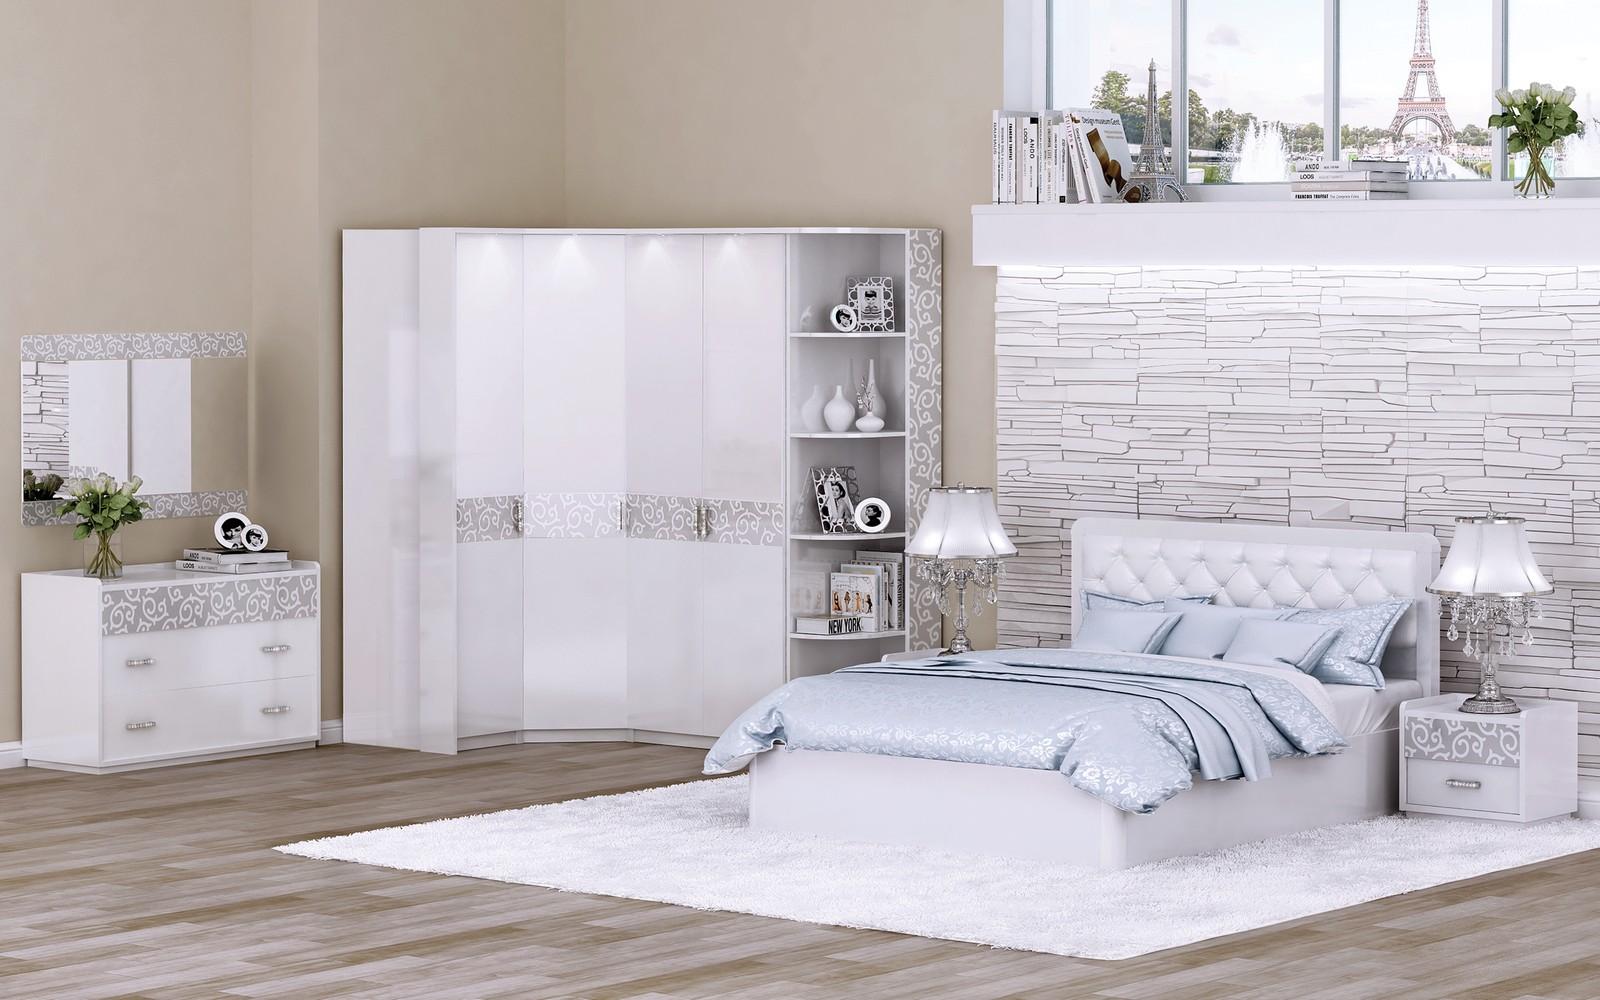 шкафы для спальни белого цвета фото